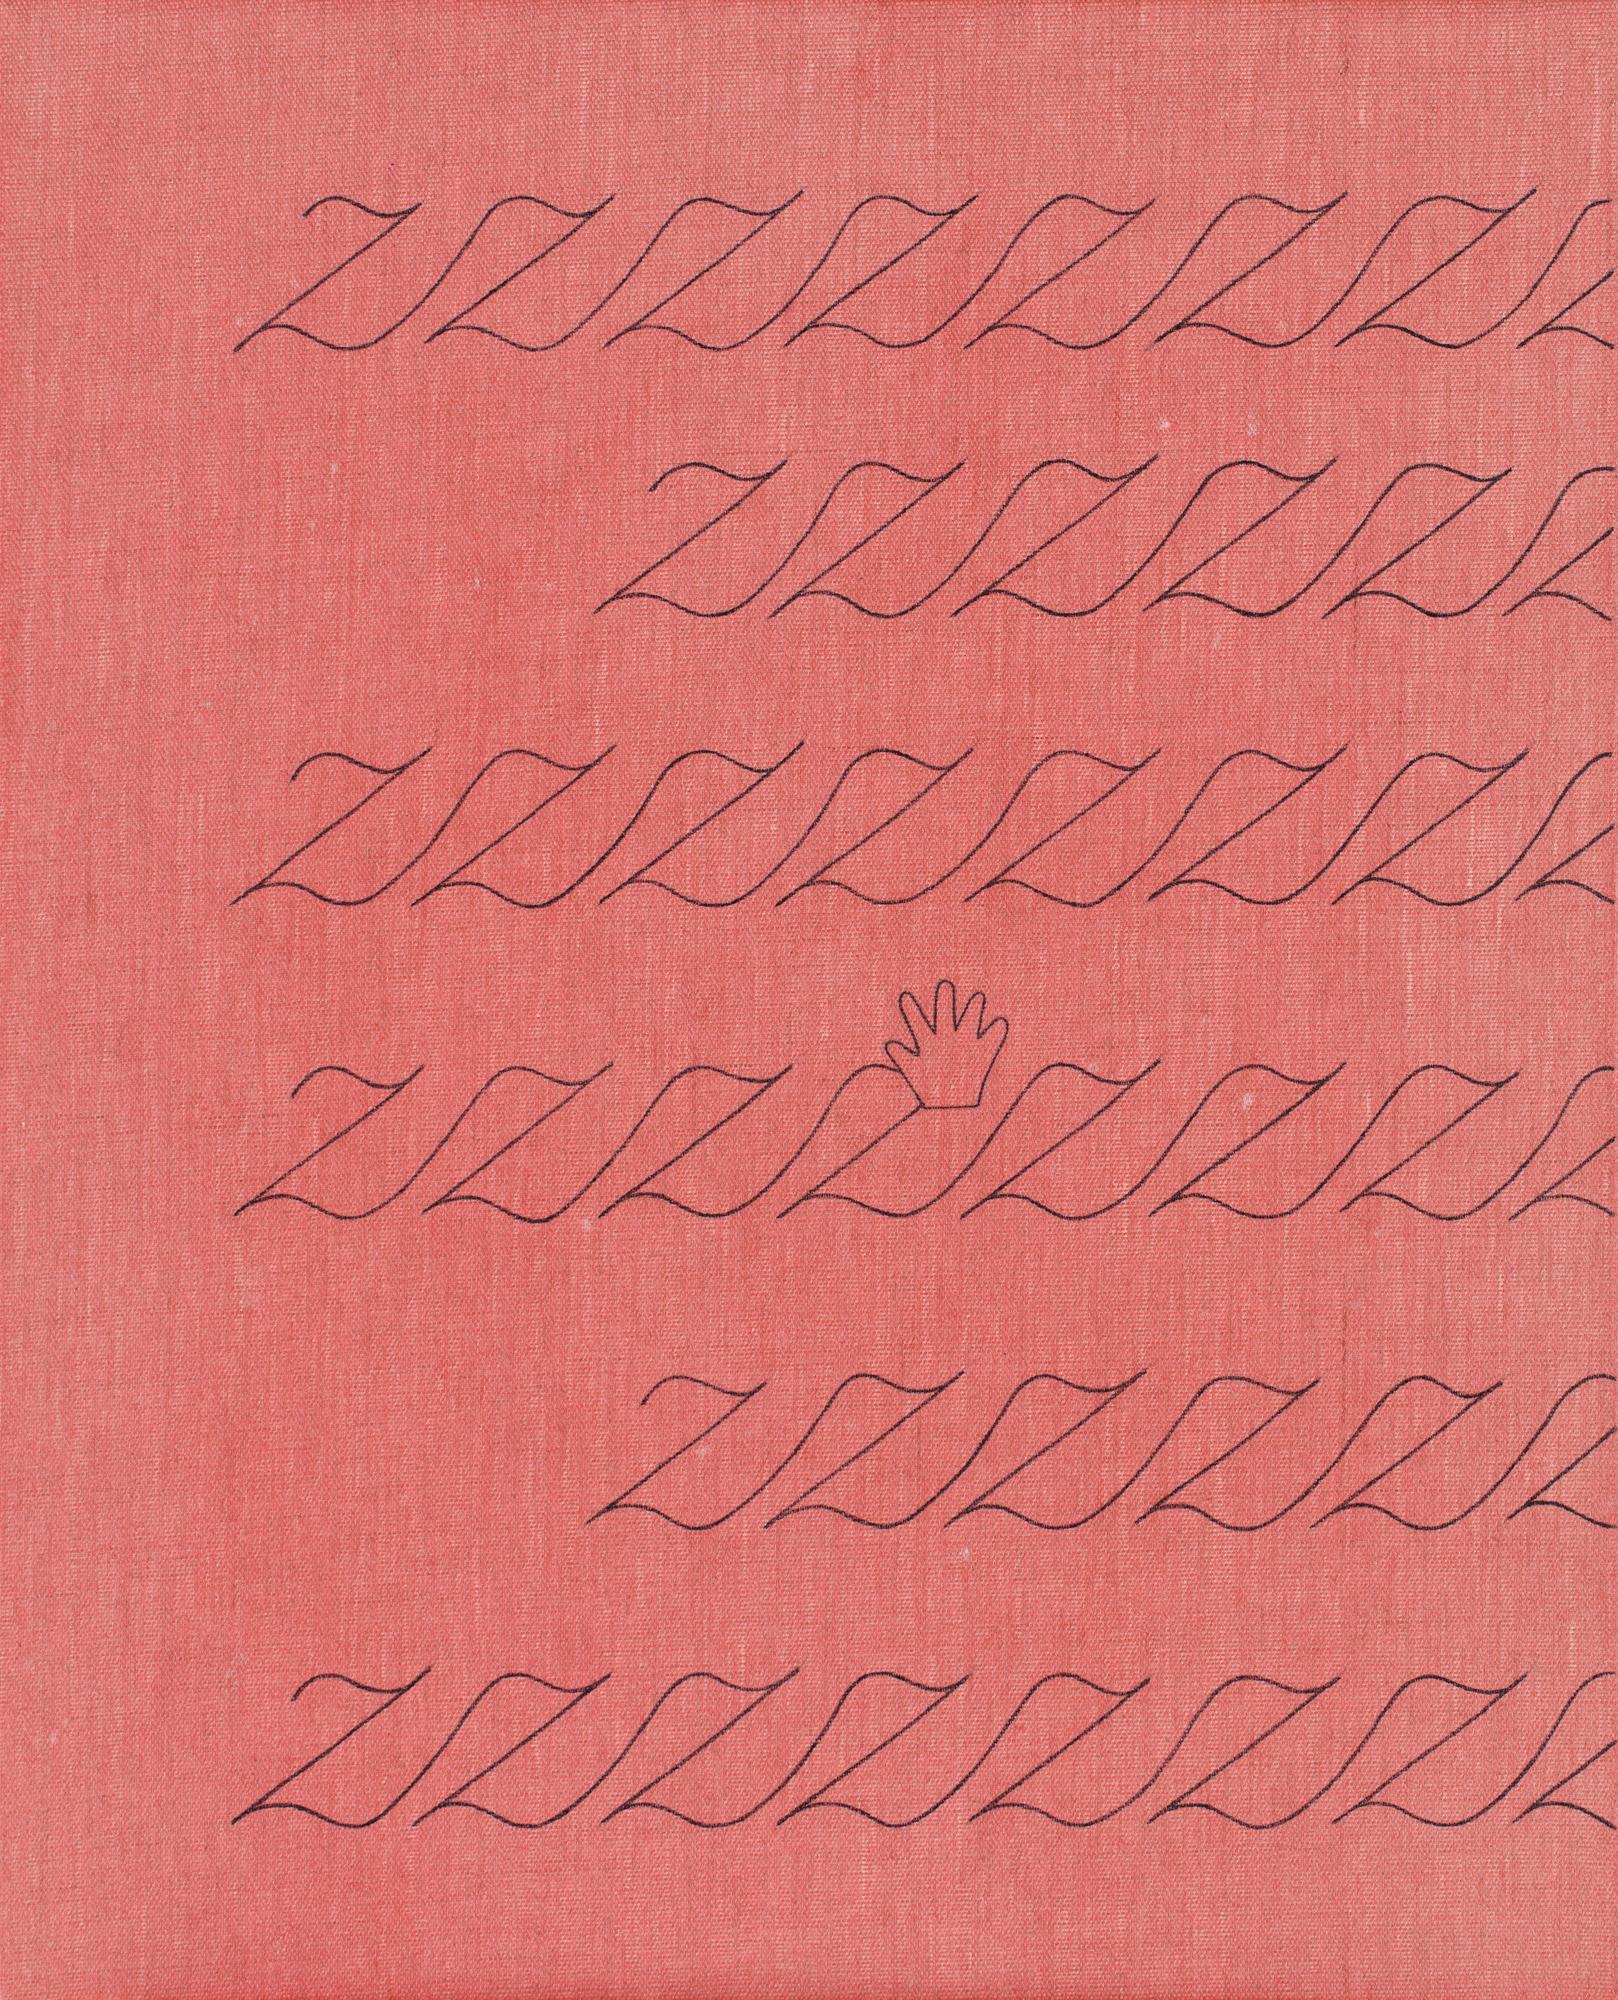 Norberg & Sundén  ZZZ  2019 Acrylic on linen cloth 55 x 44 cm